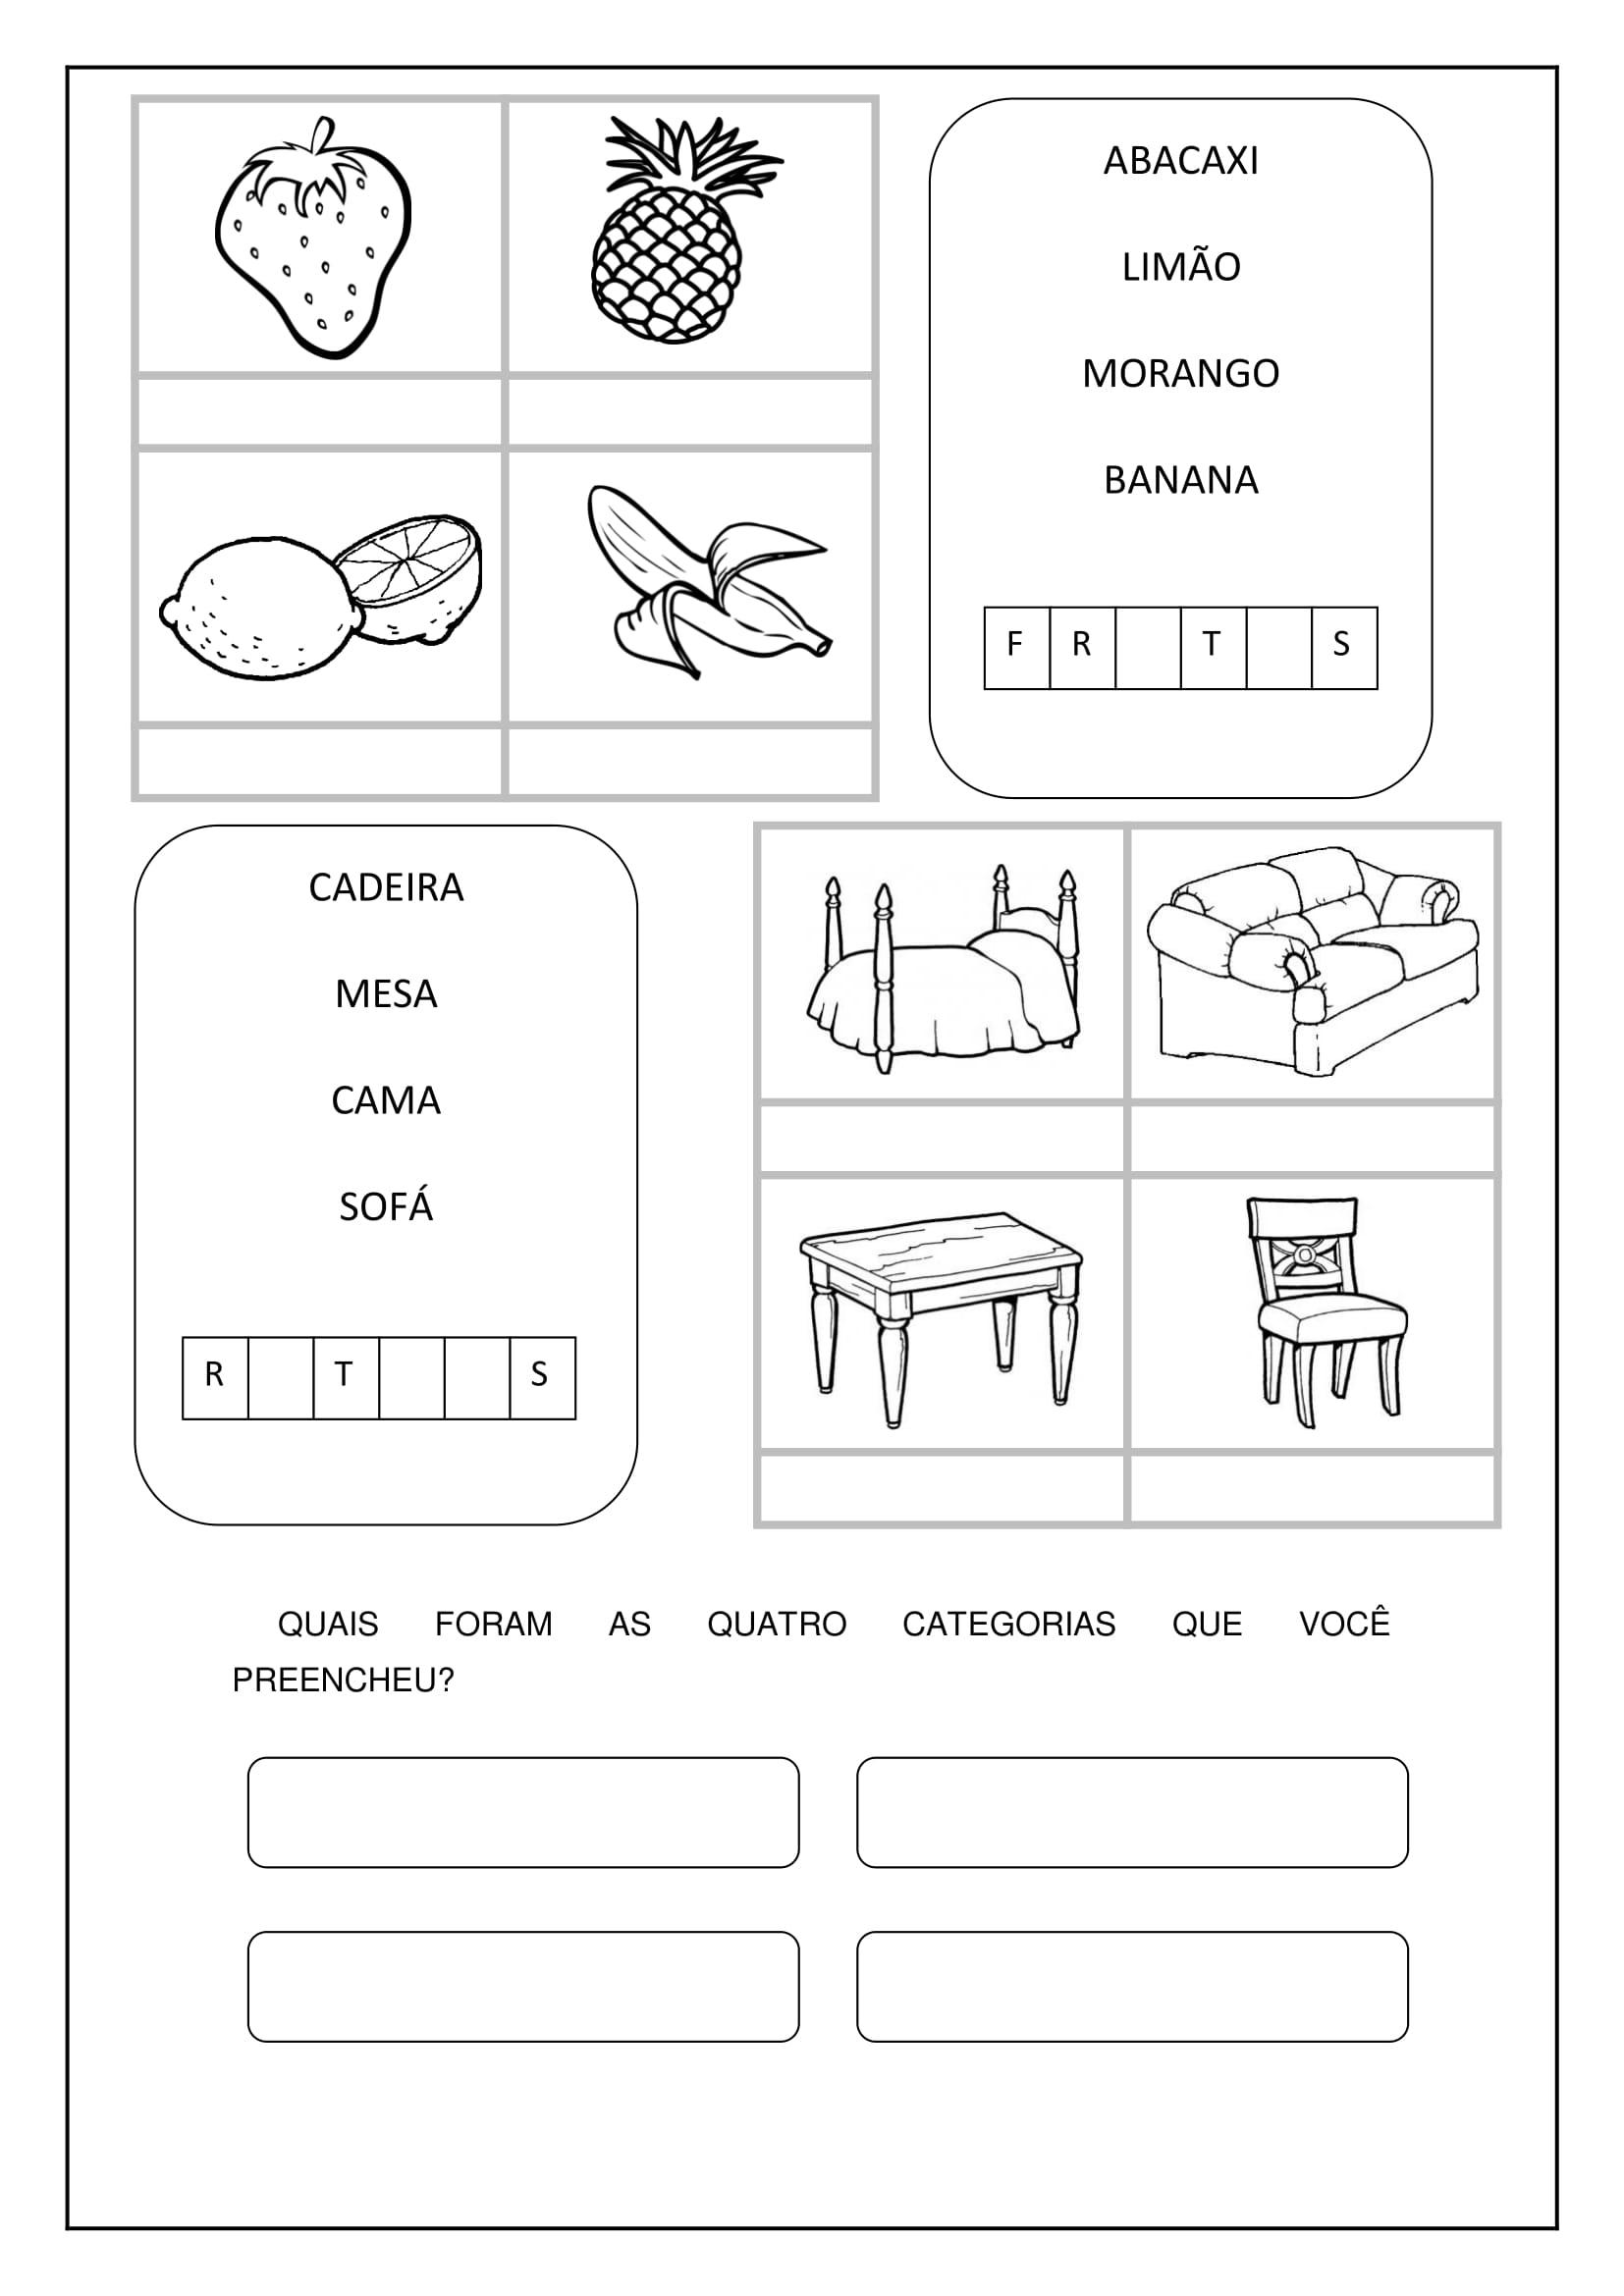 Imprimir_atividades_para_silabicos-06